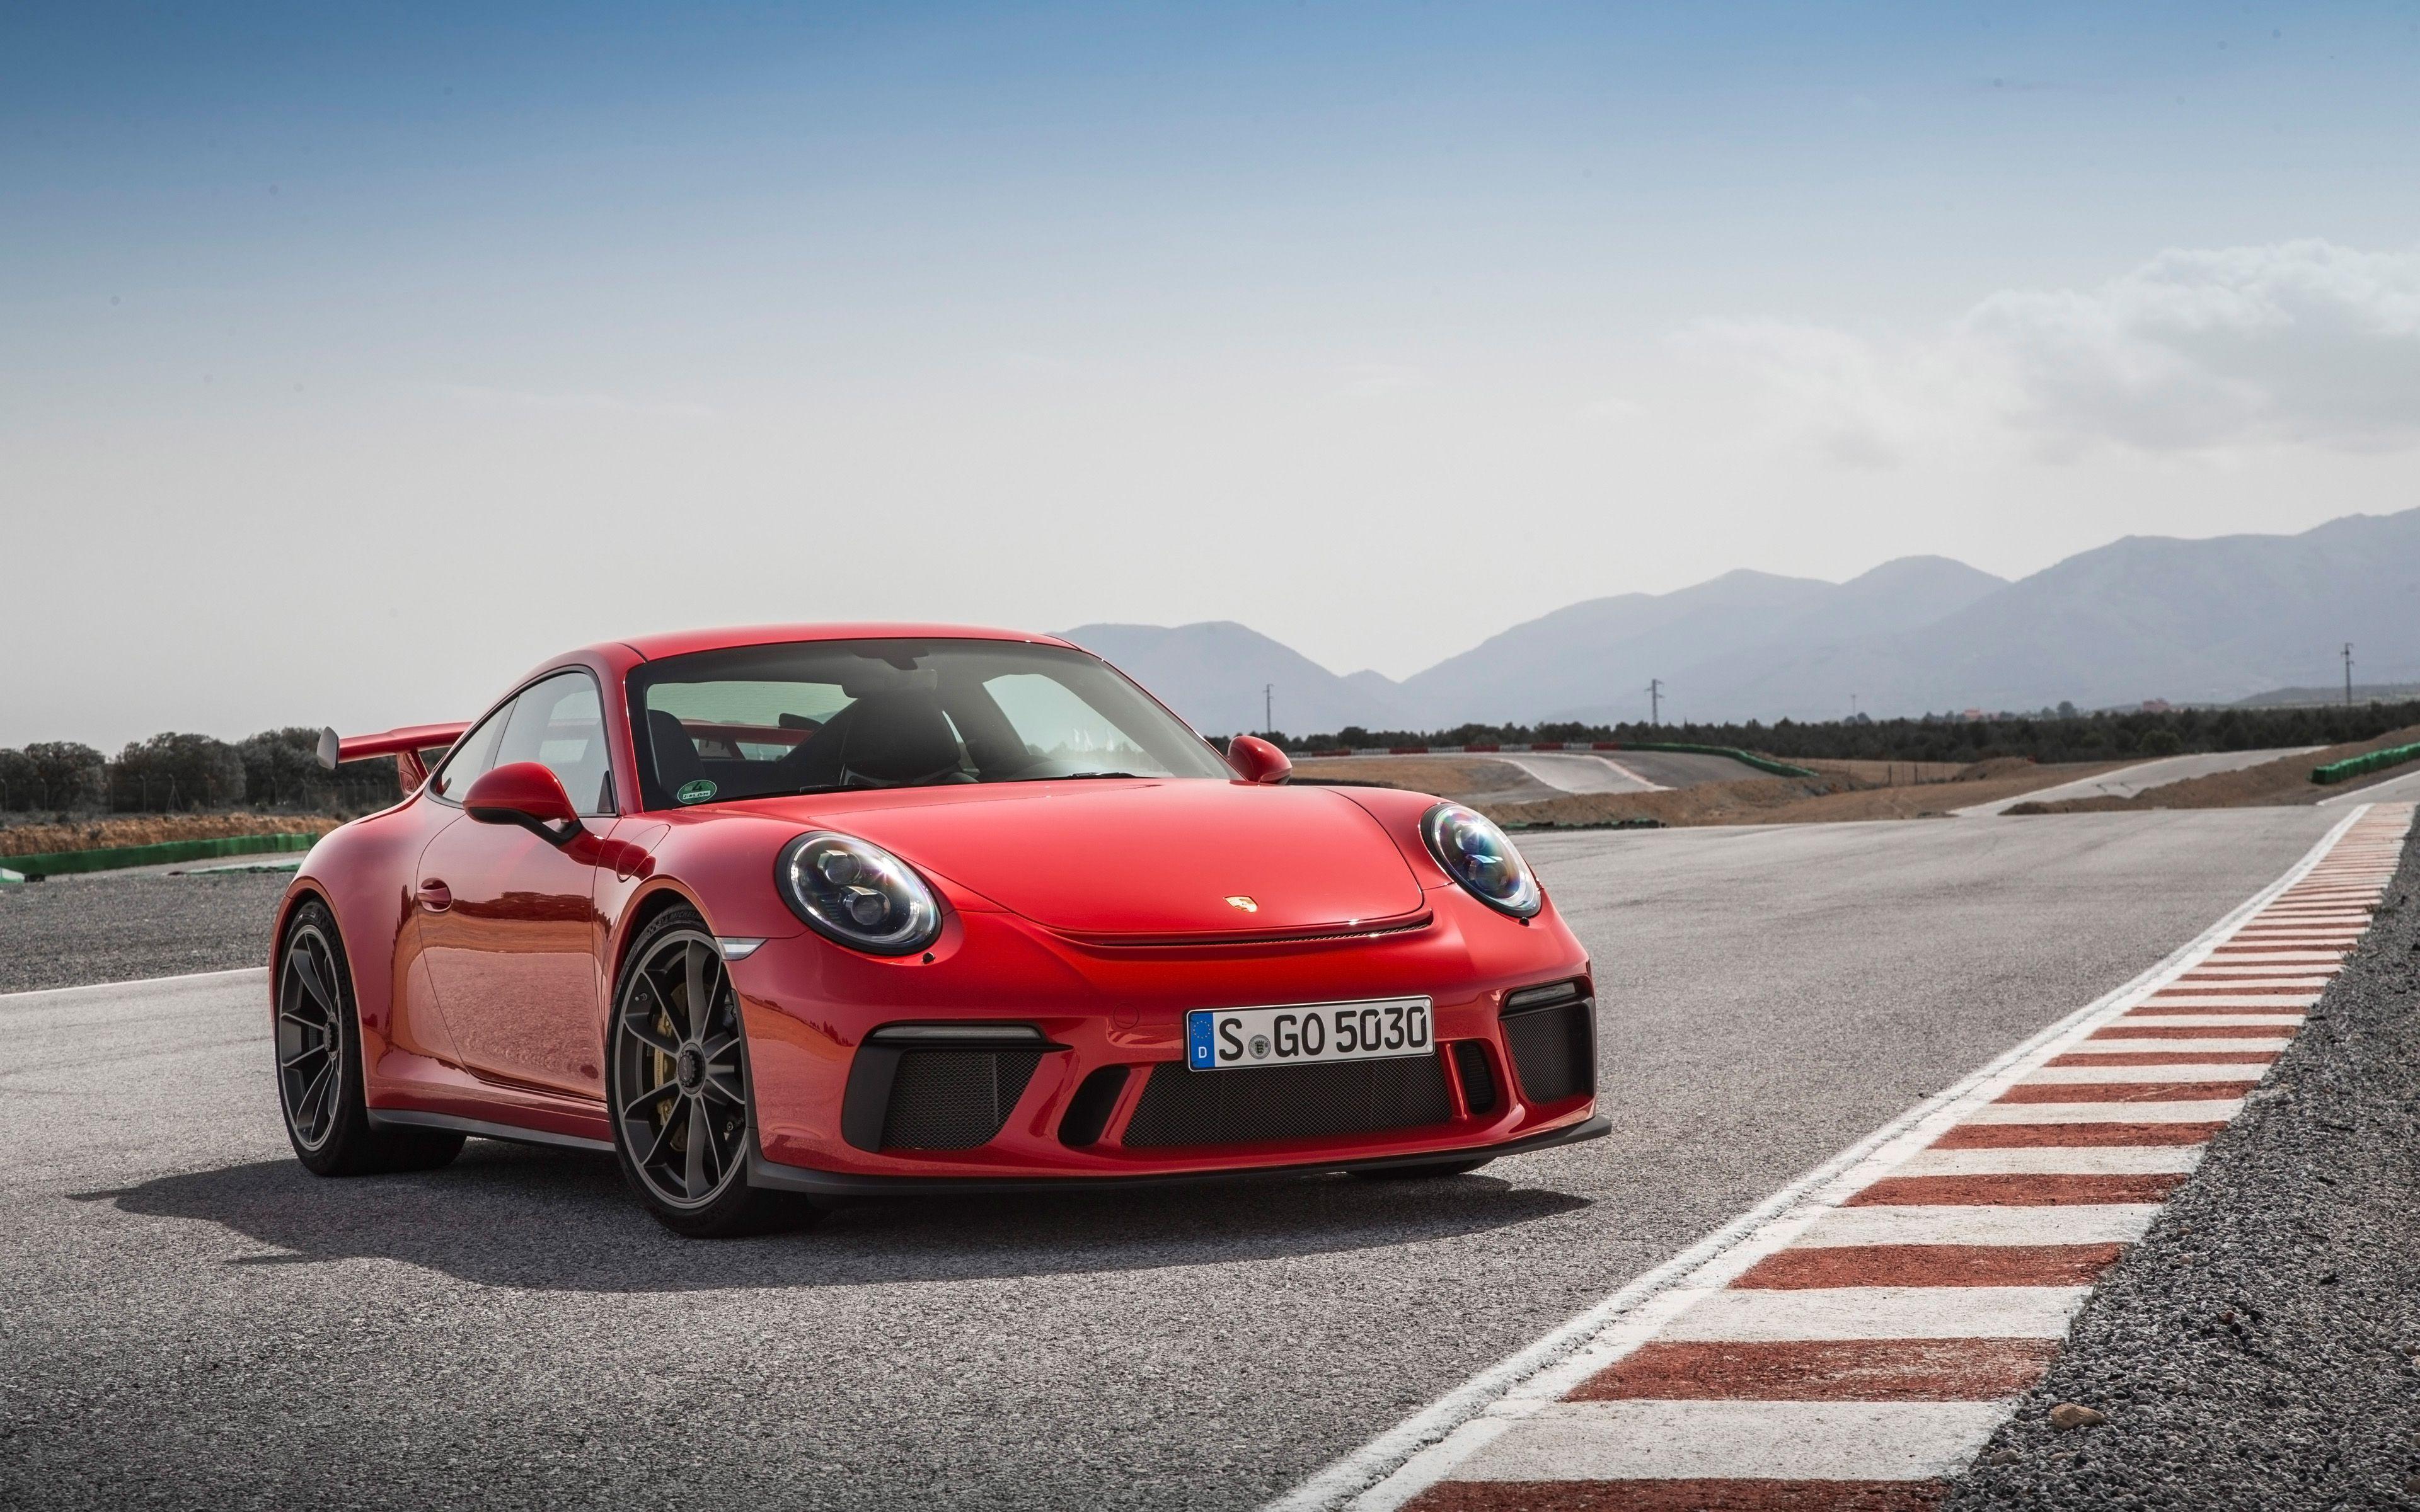 Red Porsche Wallpapers Top Free Red Porsche Backgrounds